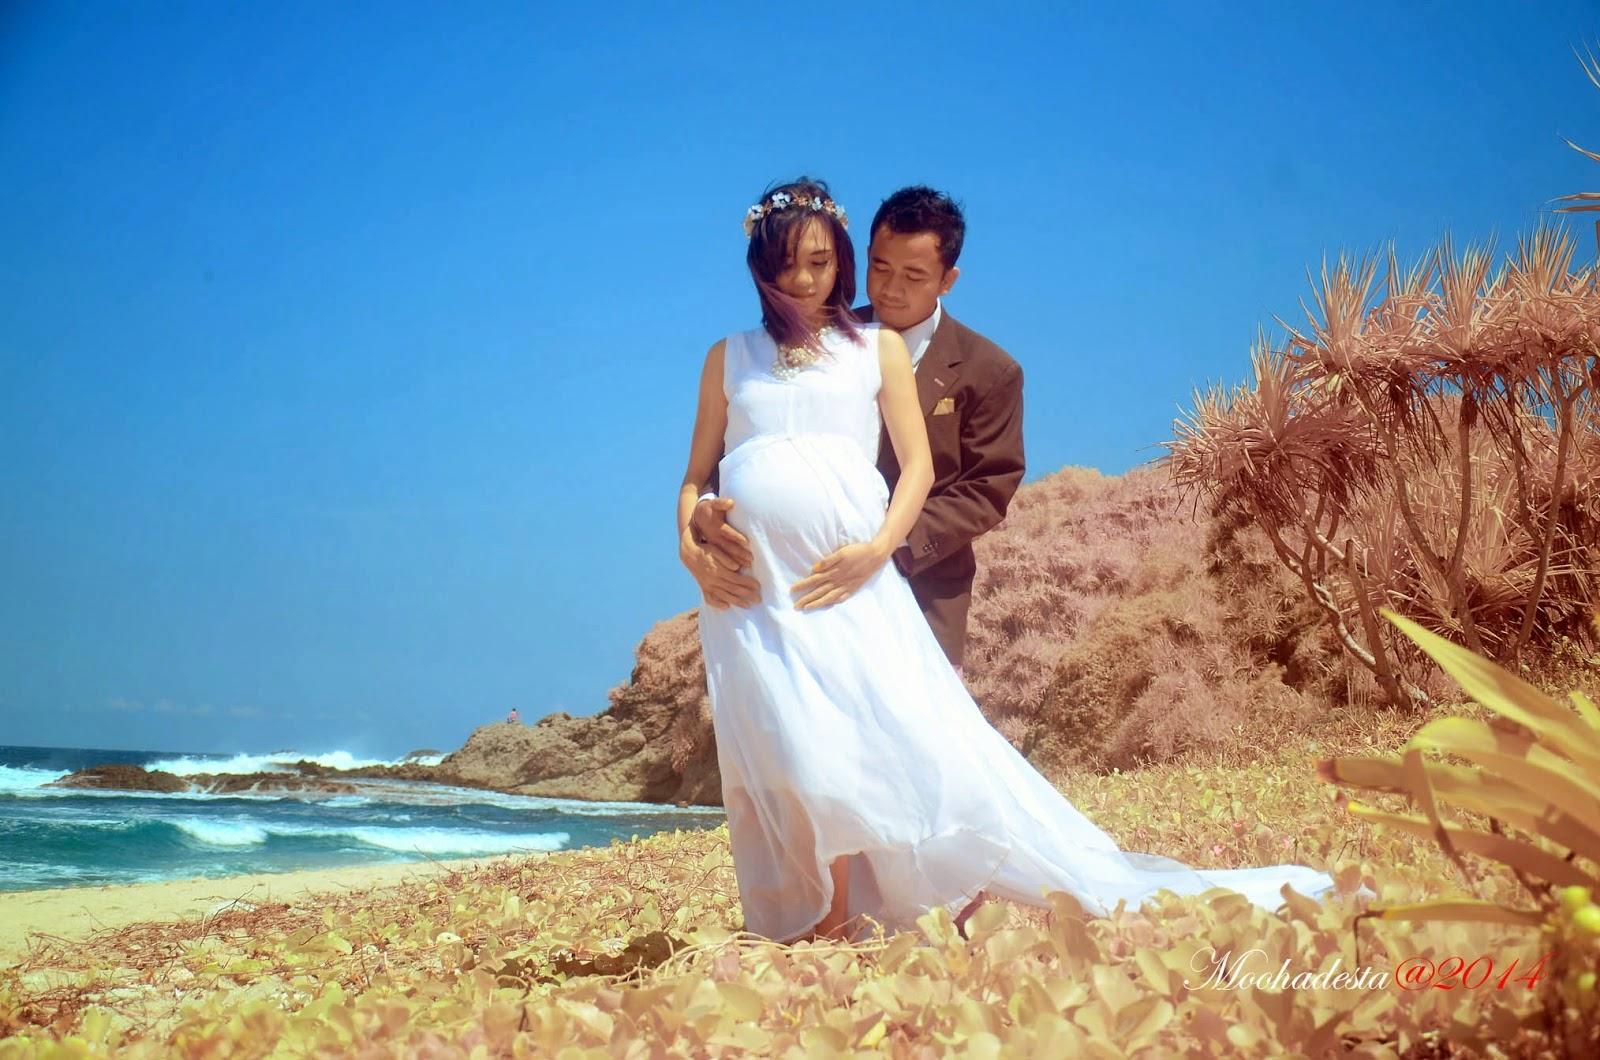 10 Best Foto Prewedding Jogja Paket Foto Pre Wedding: Jasa Foto Prewedding Murah Di